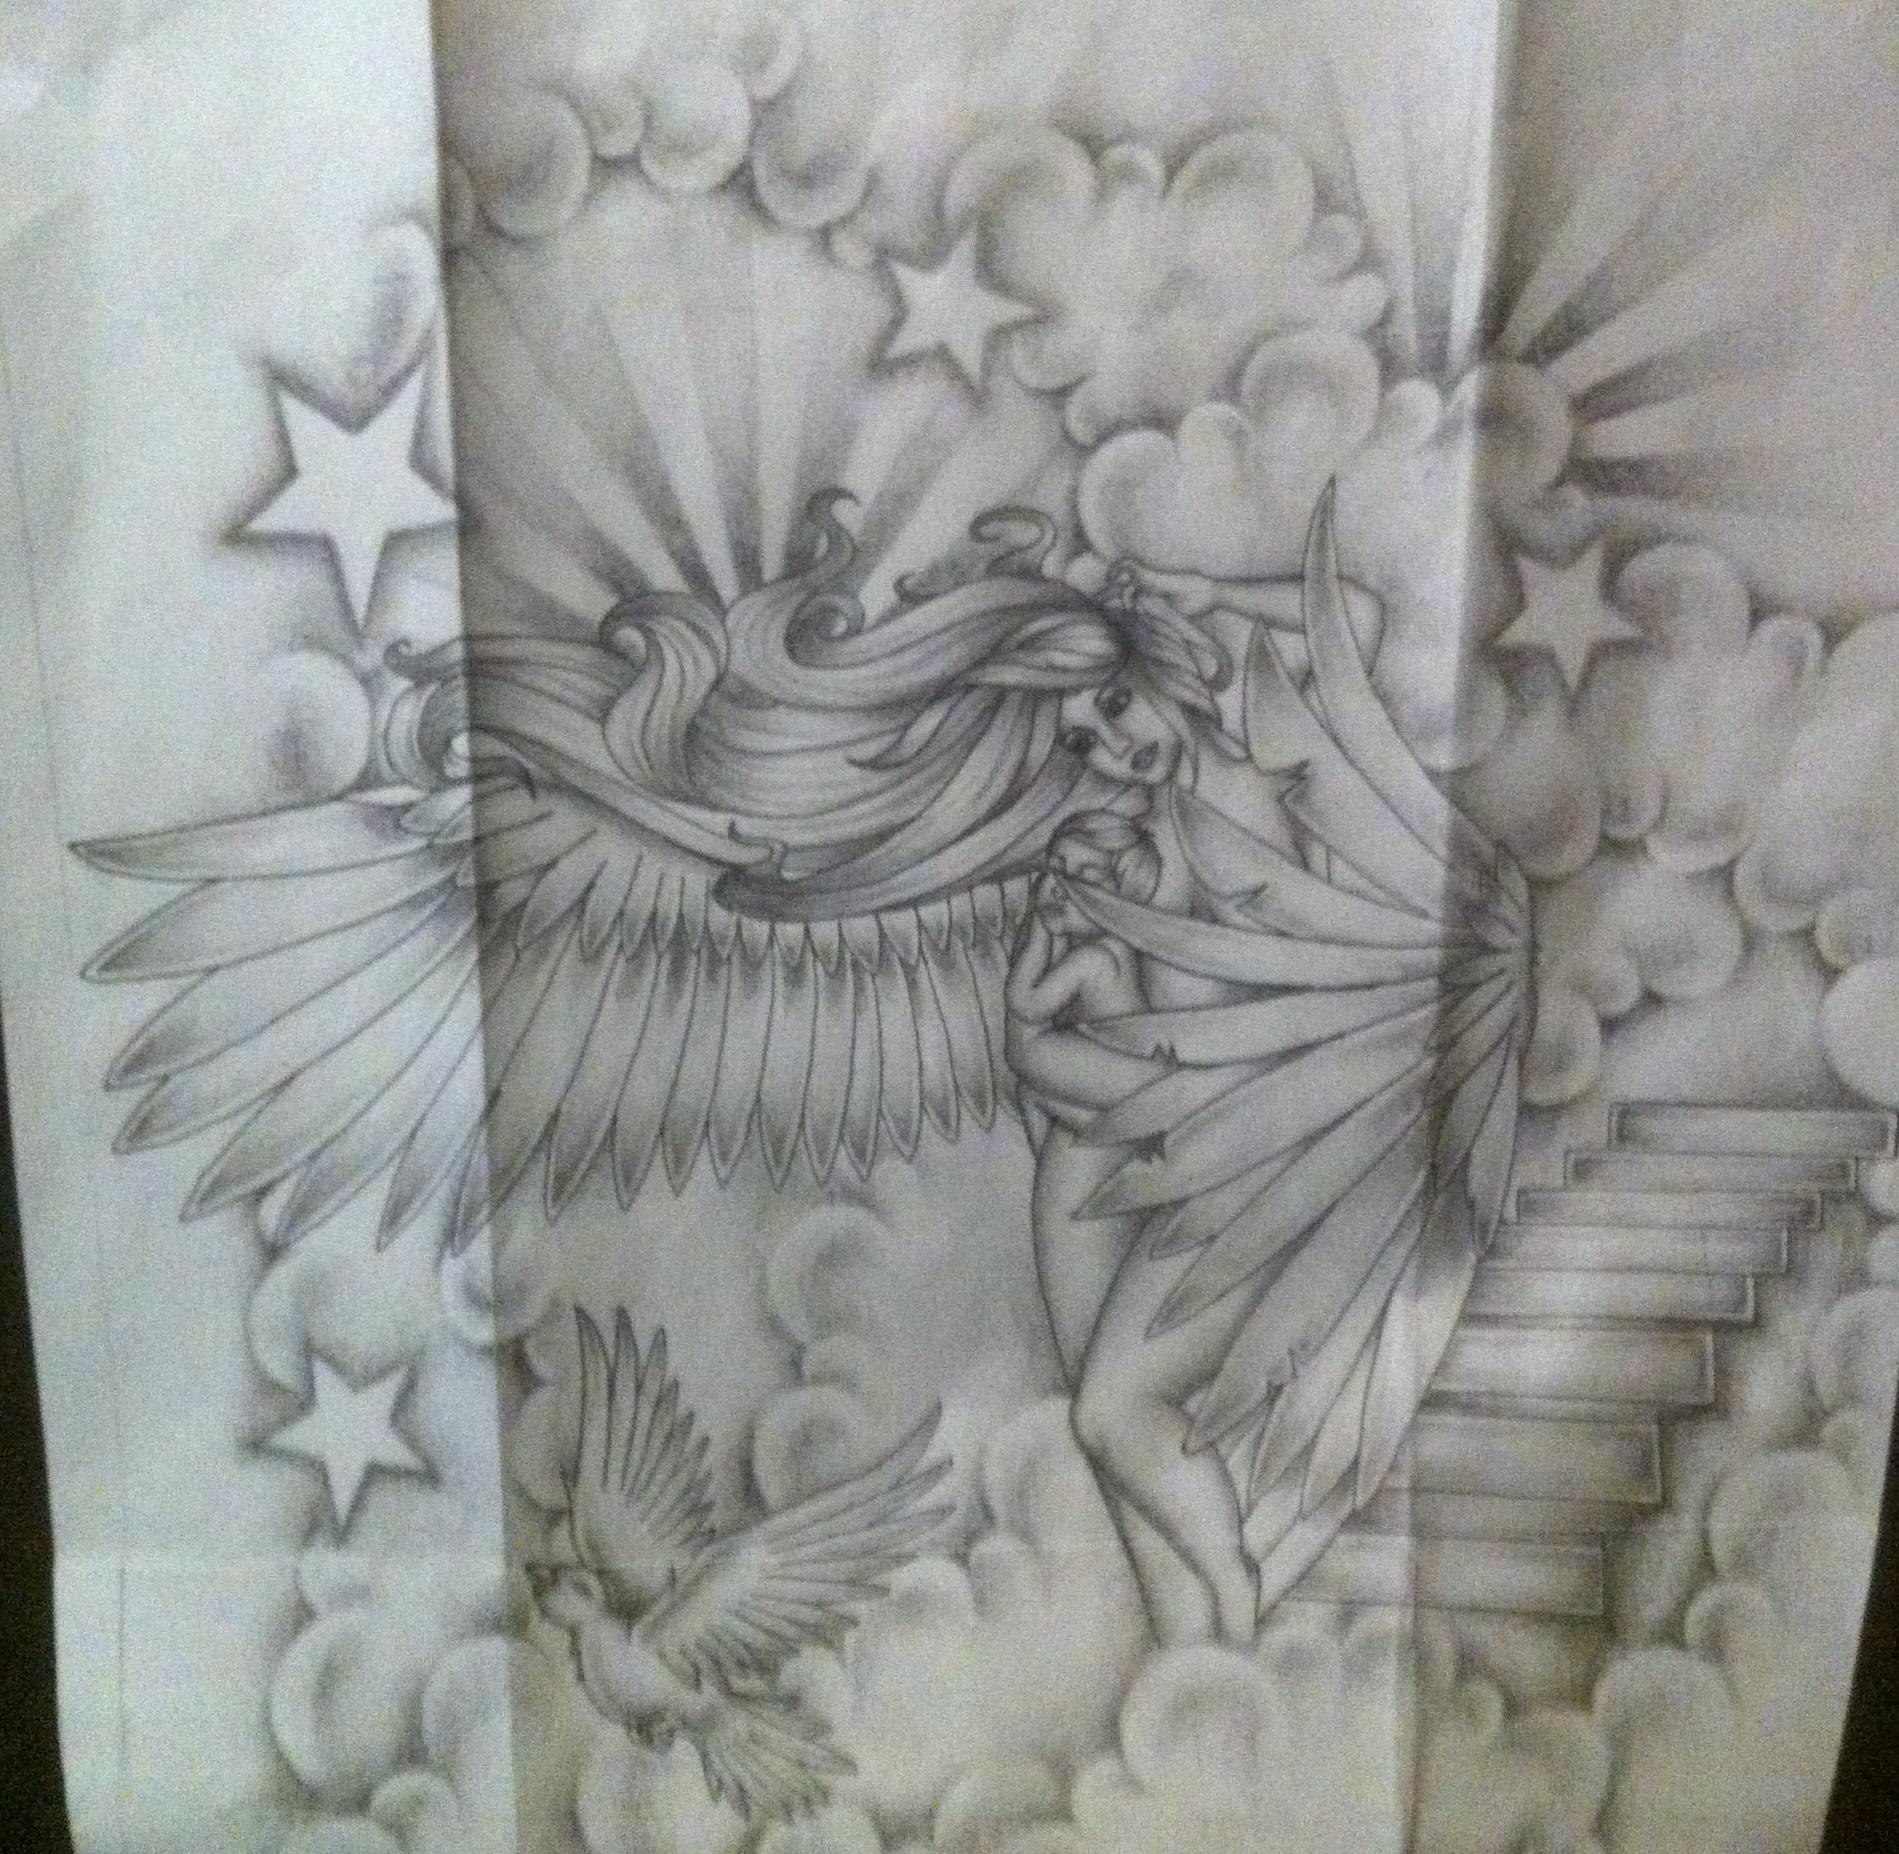 angel holding baby tattoo design sleeve by tattoosuzette on deviantart. Black Bedroom Furniture Sets. Home Design Ideas